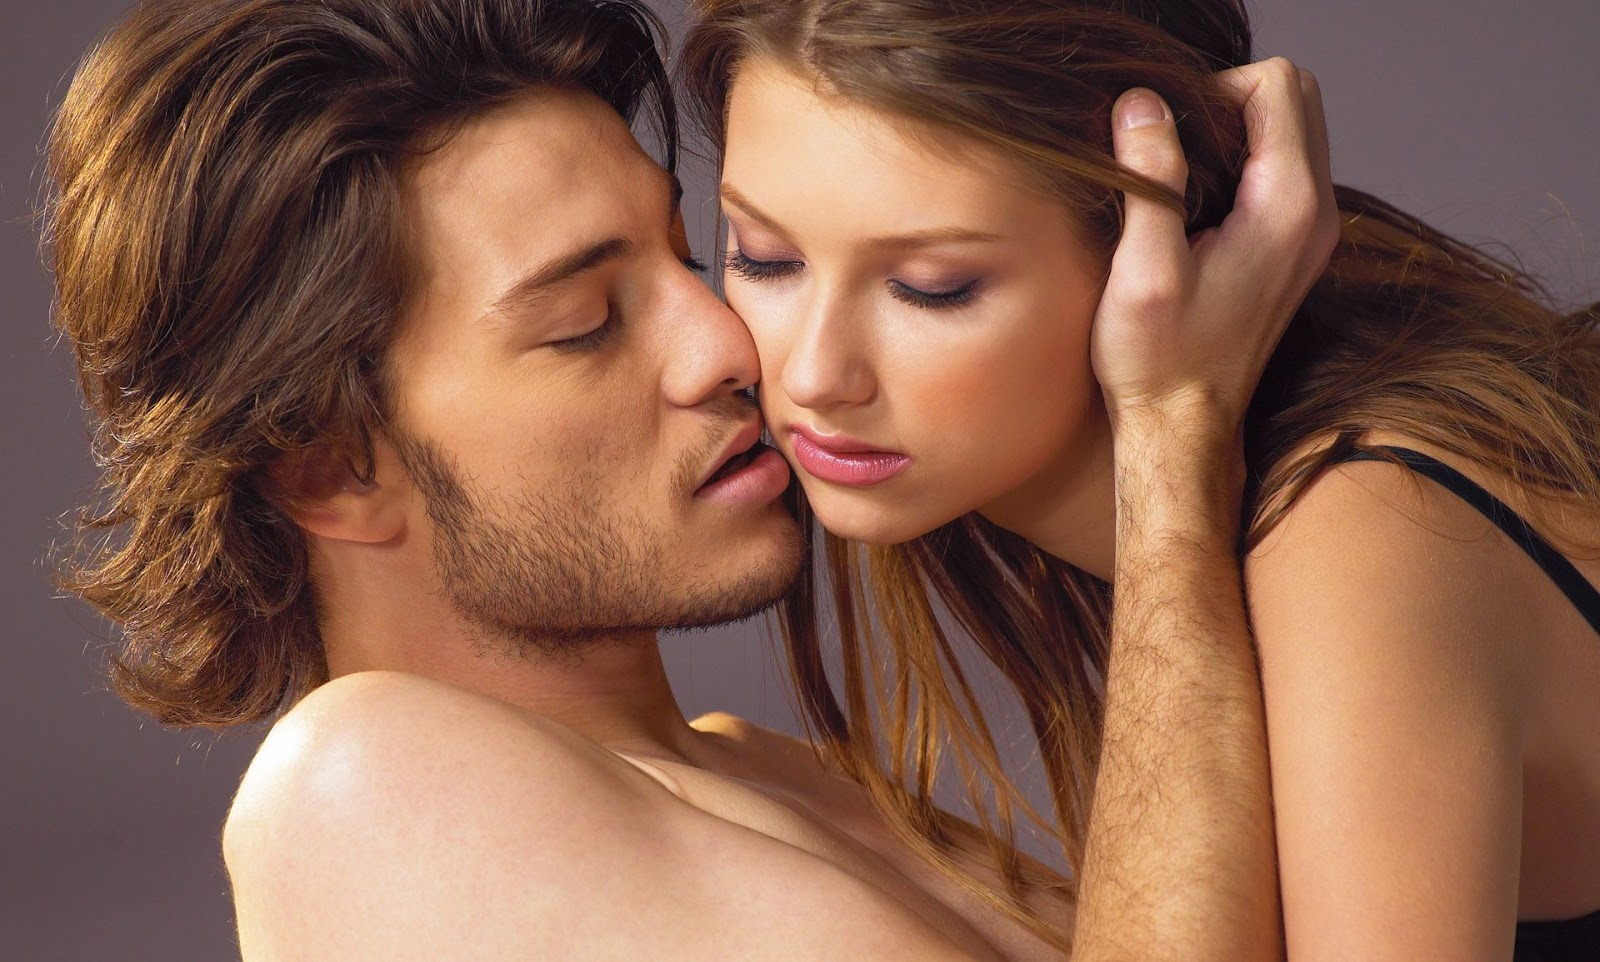 internet-magazini-eroticheskih-i-pornograficheskih-filmov